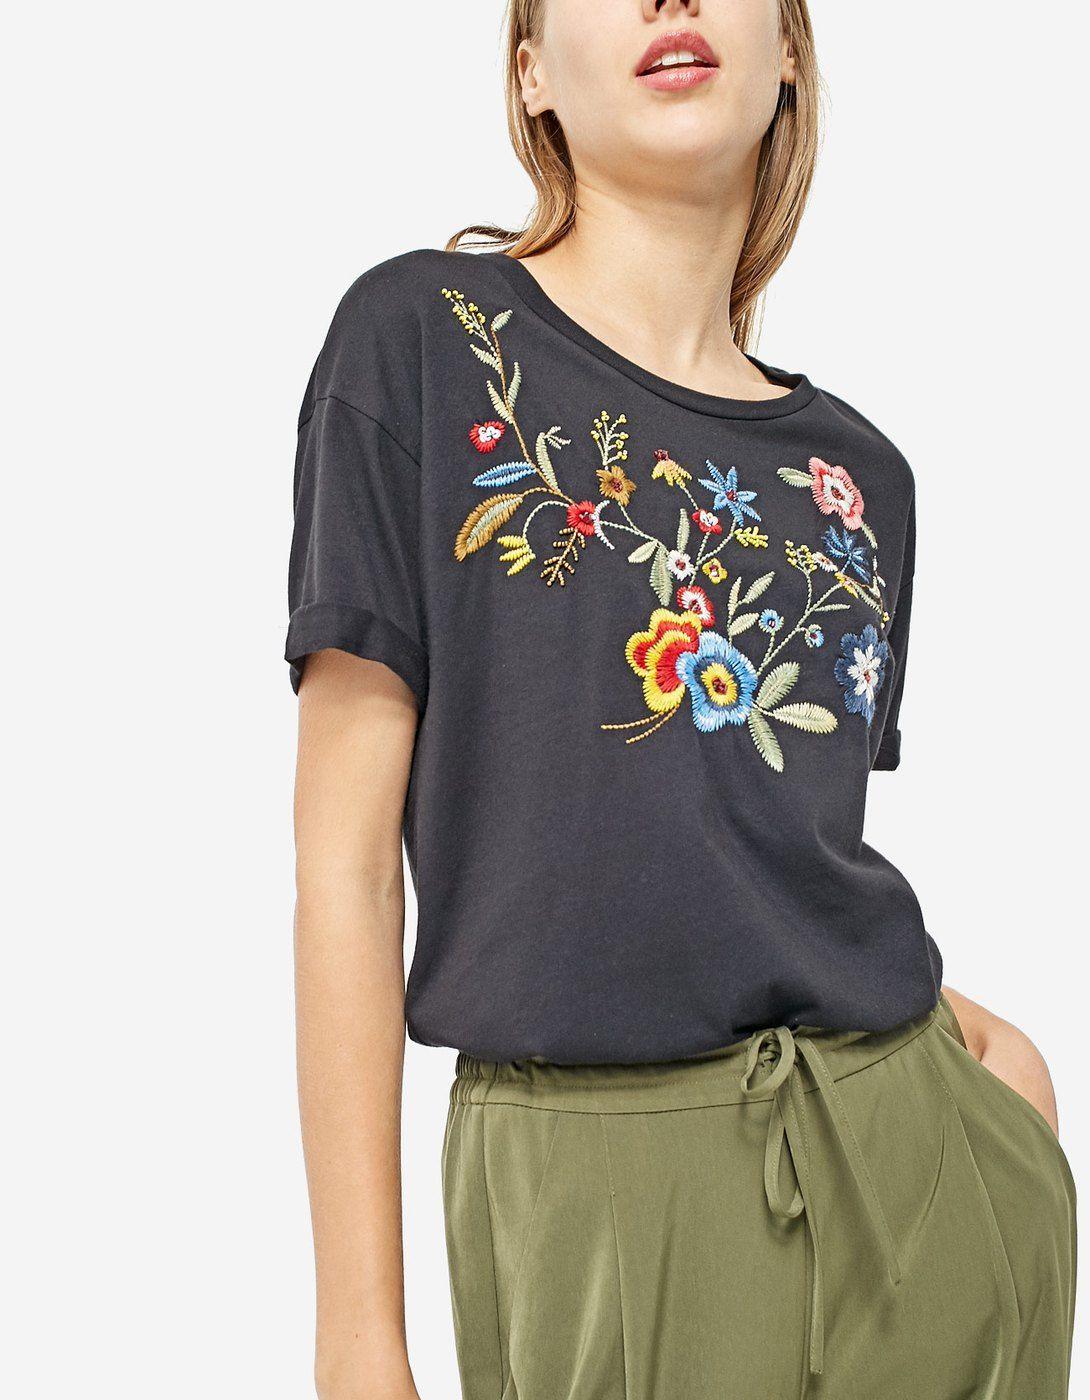 Camiseta bordados - Gorros y sombreros  ecd71b4d27bc9